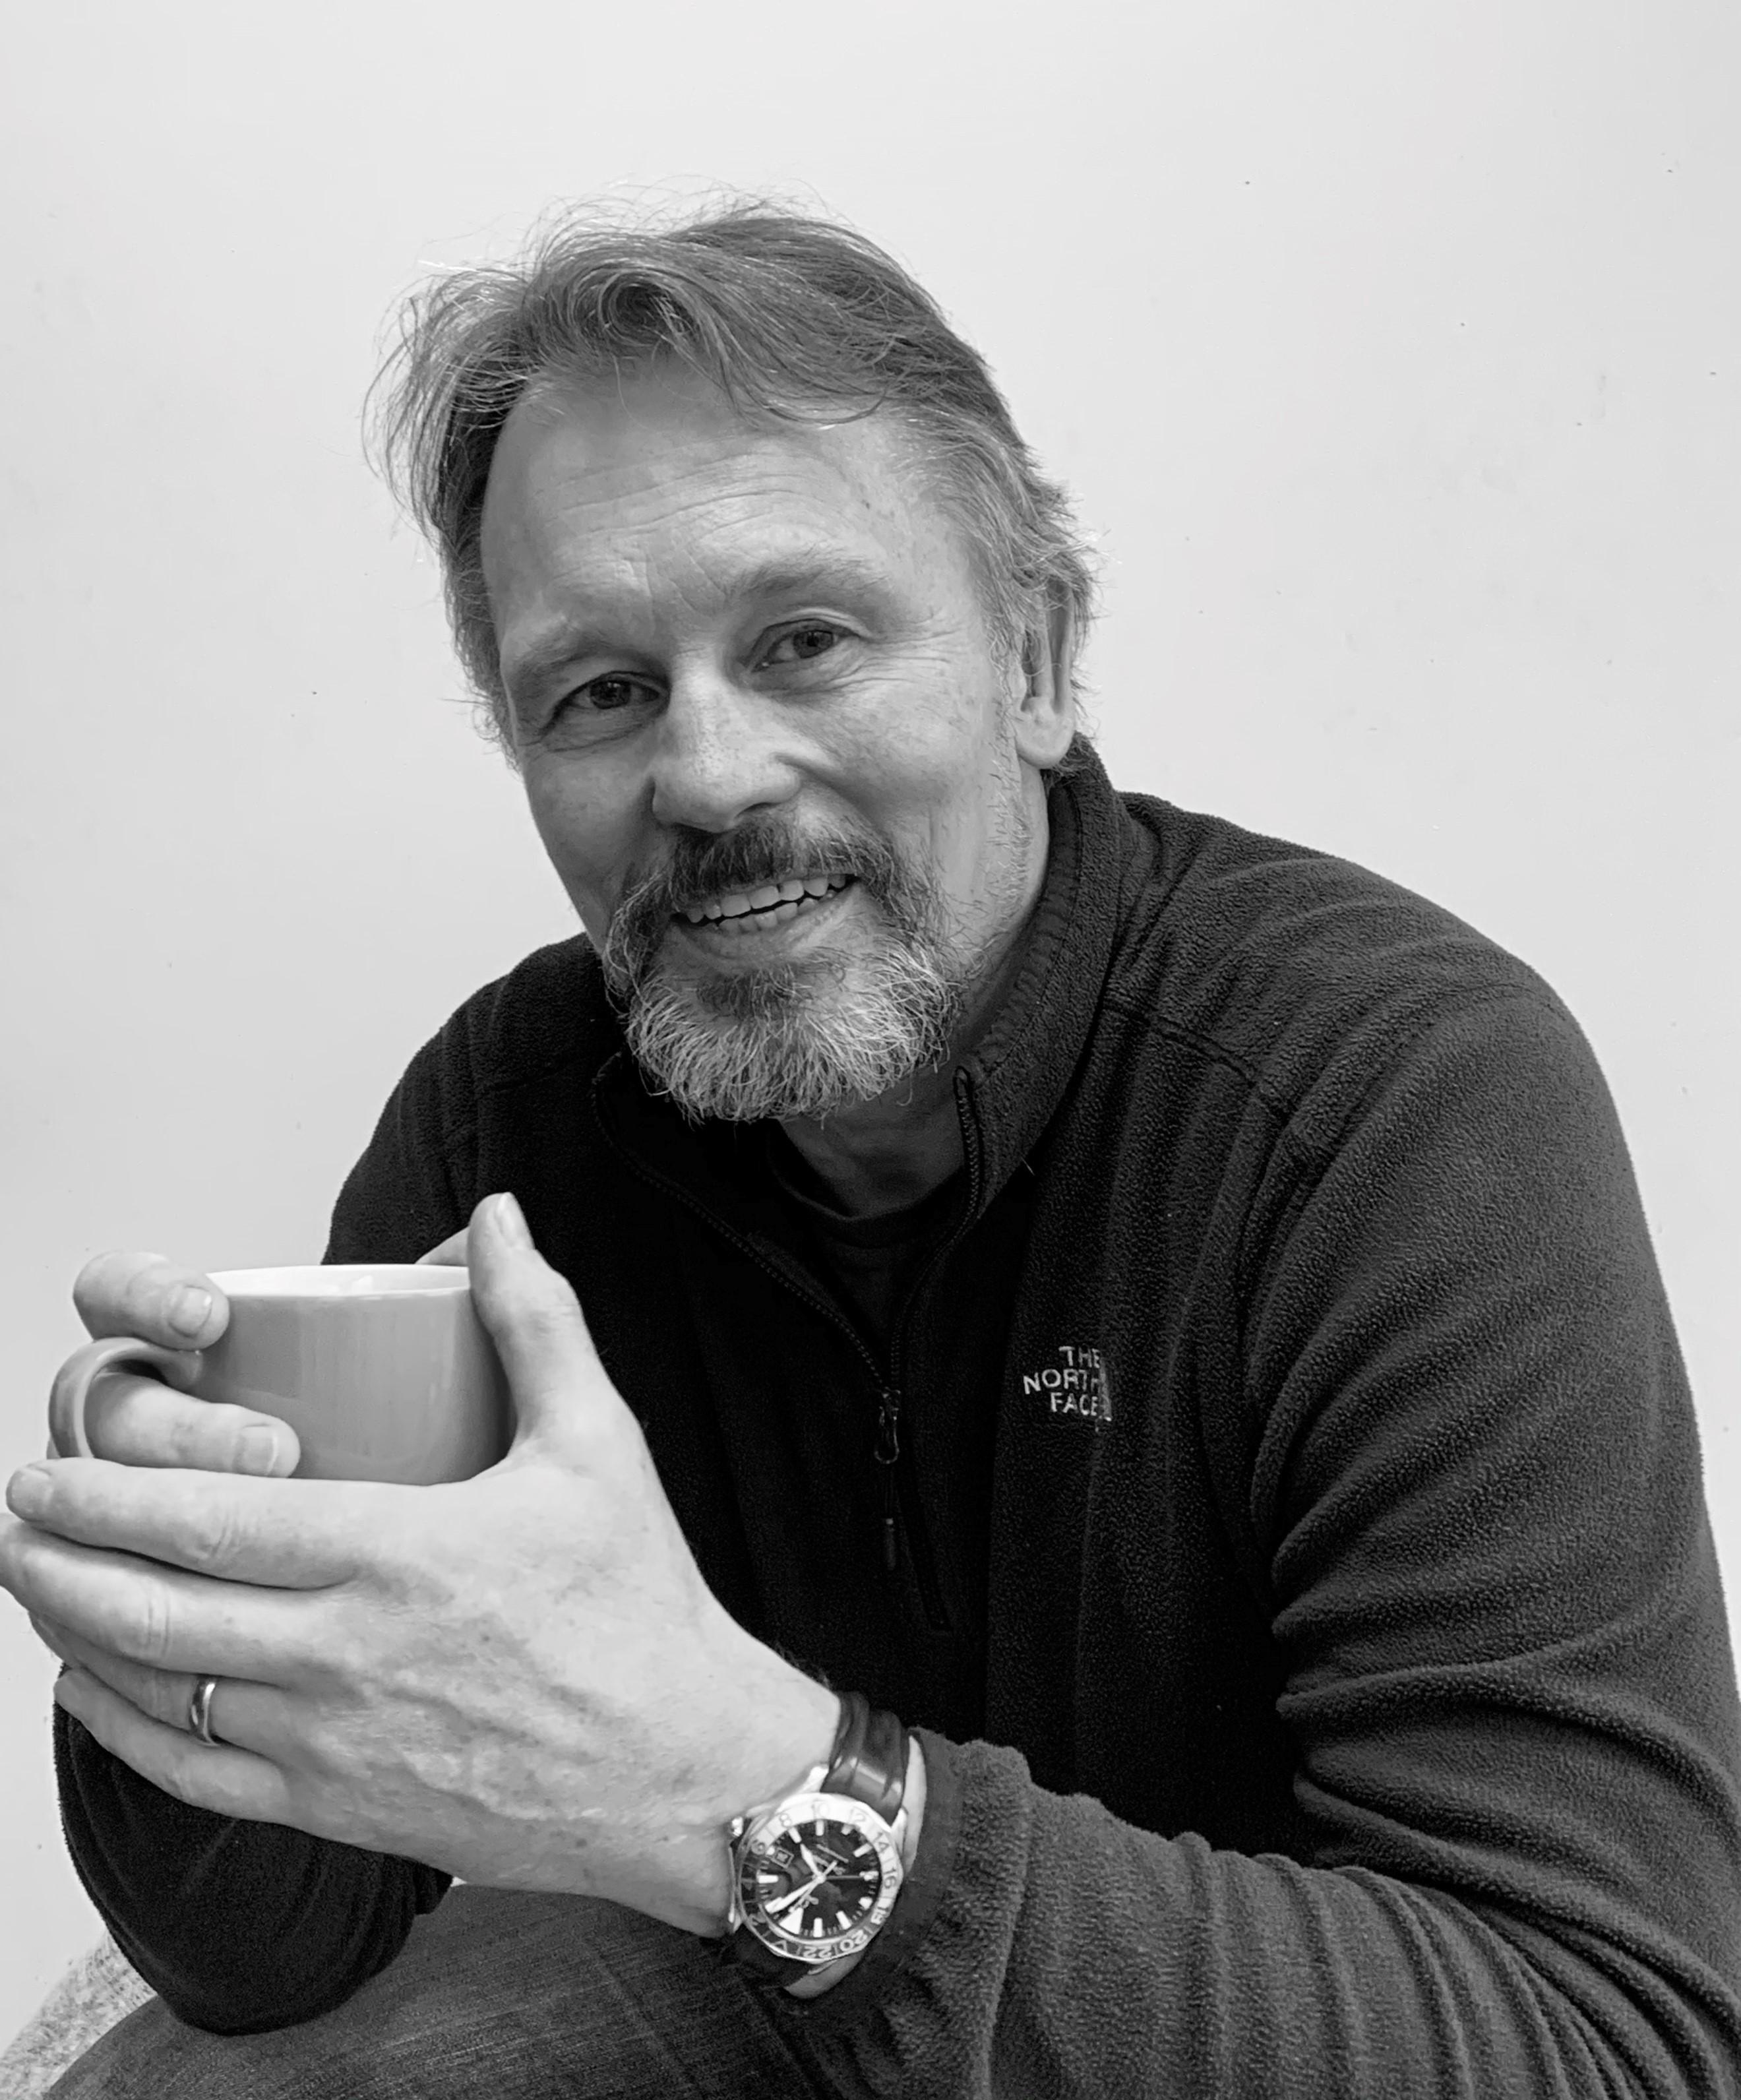 David Wakley